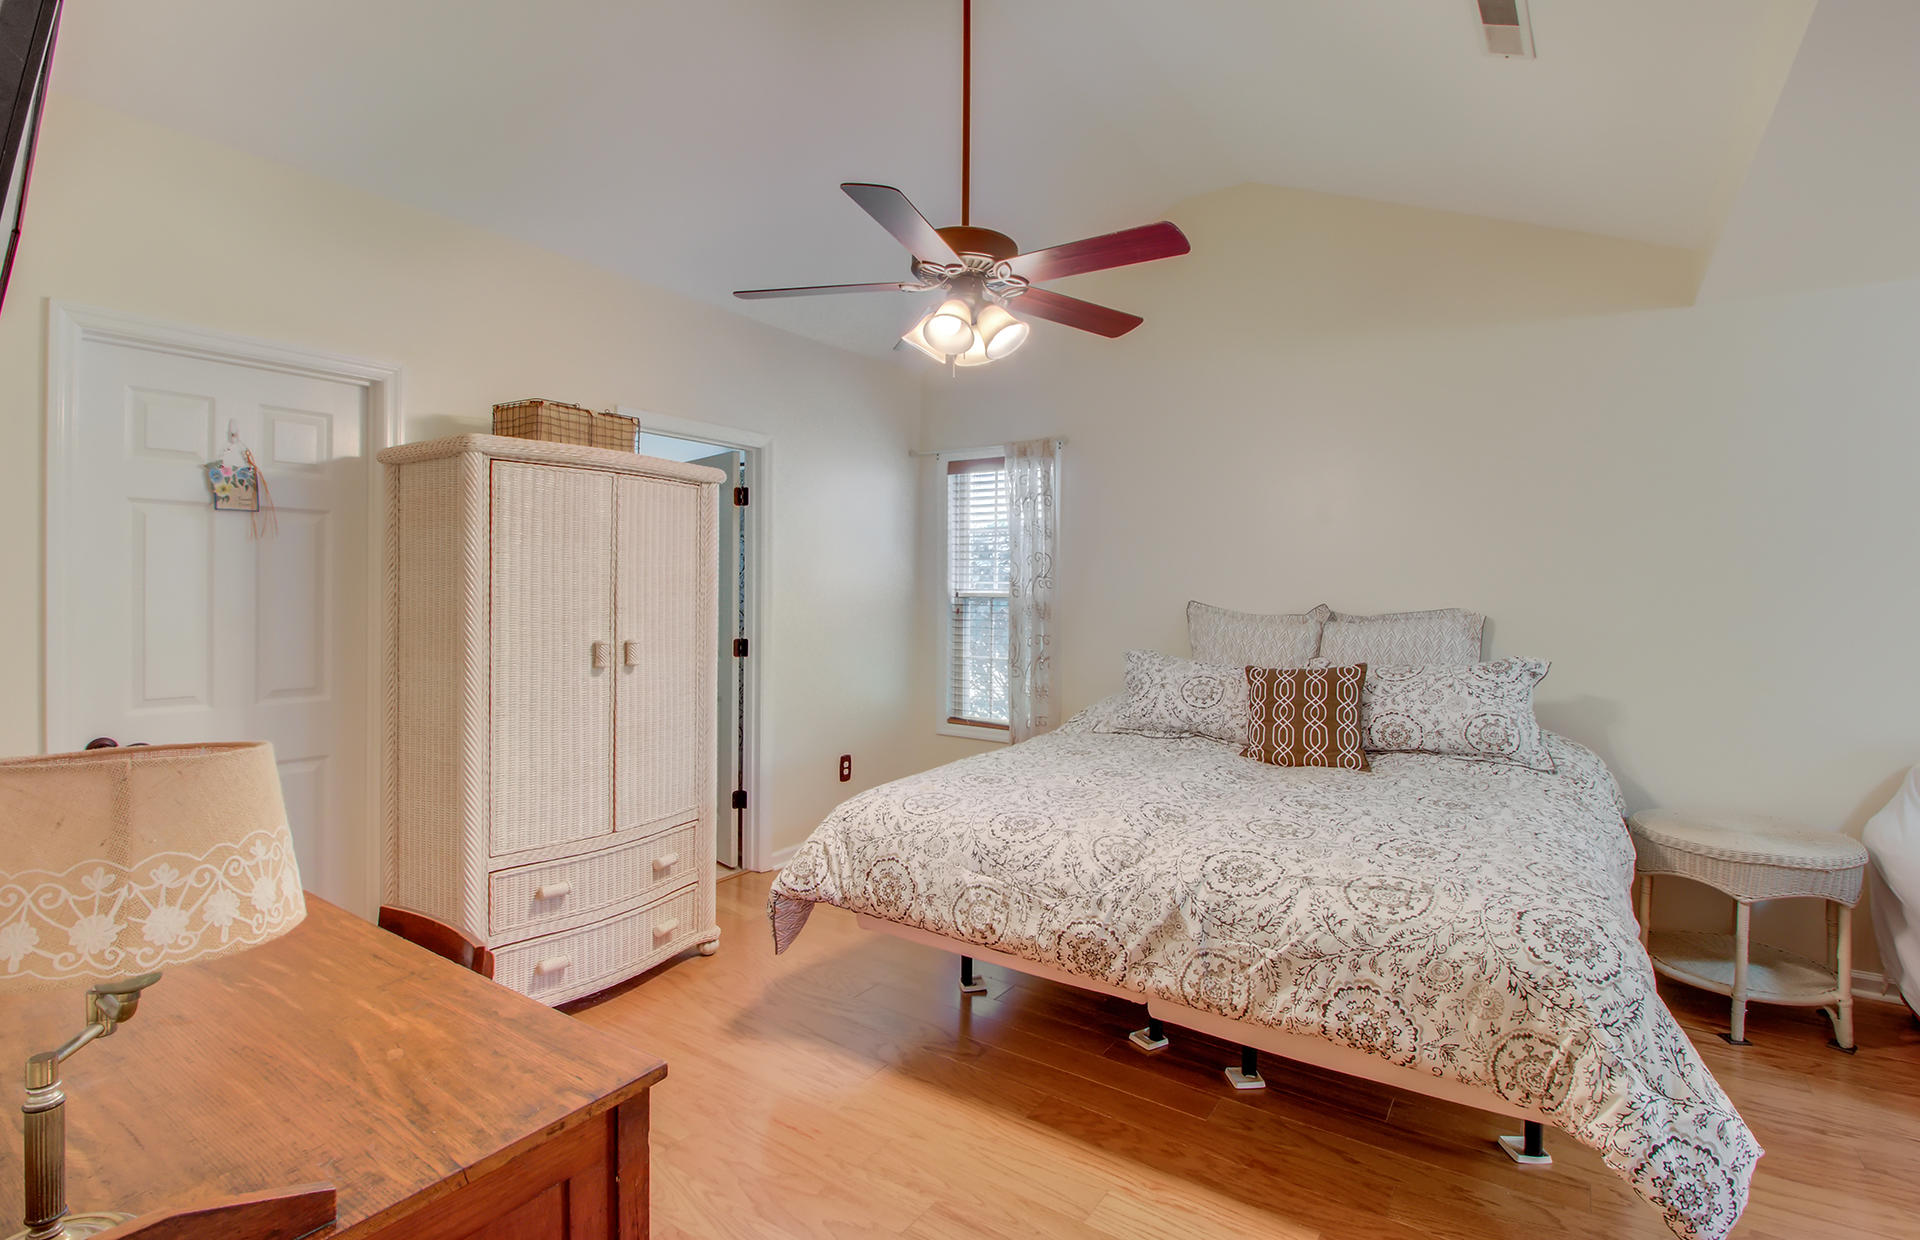 Park West Homes For Sale - 1500 Wellesley, Mount Pleasant, SC - 4